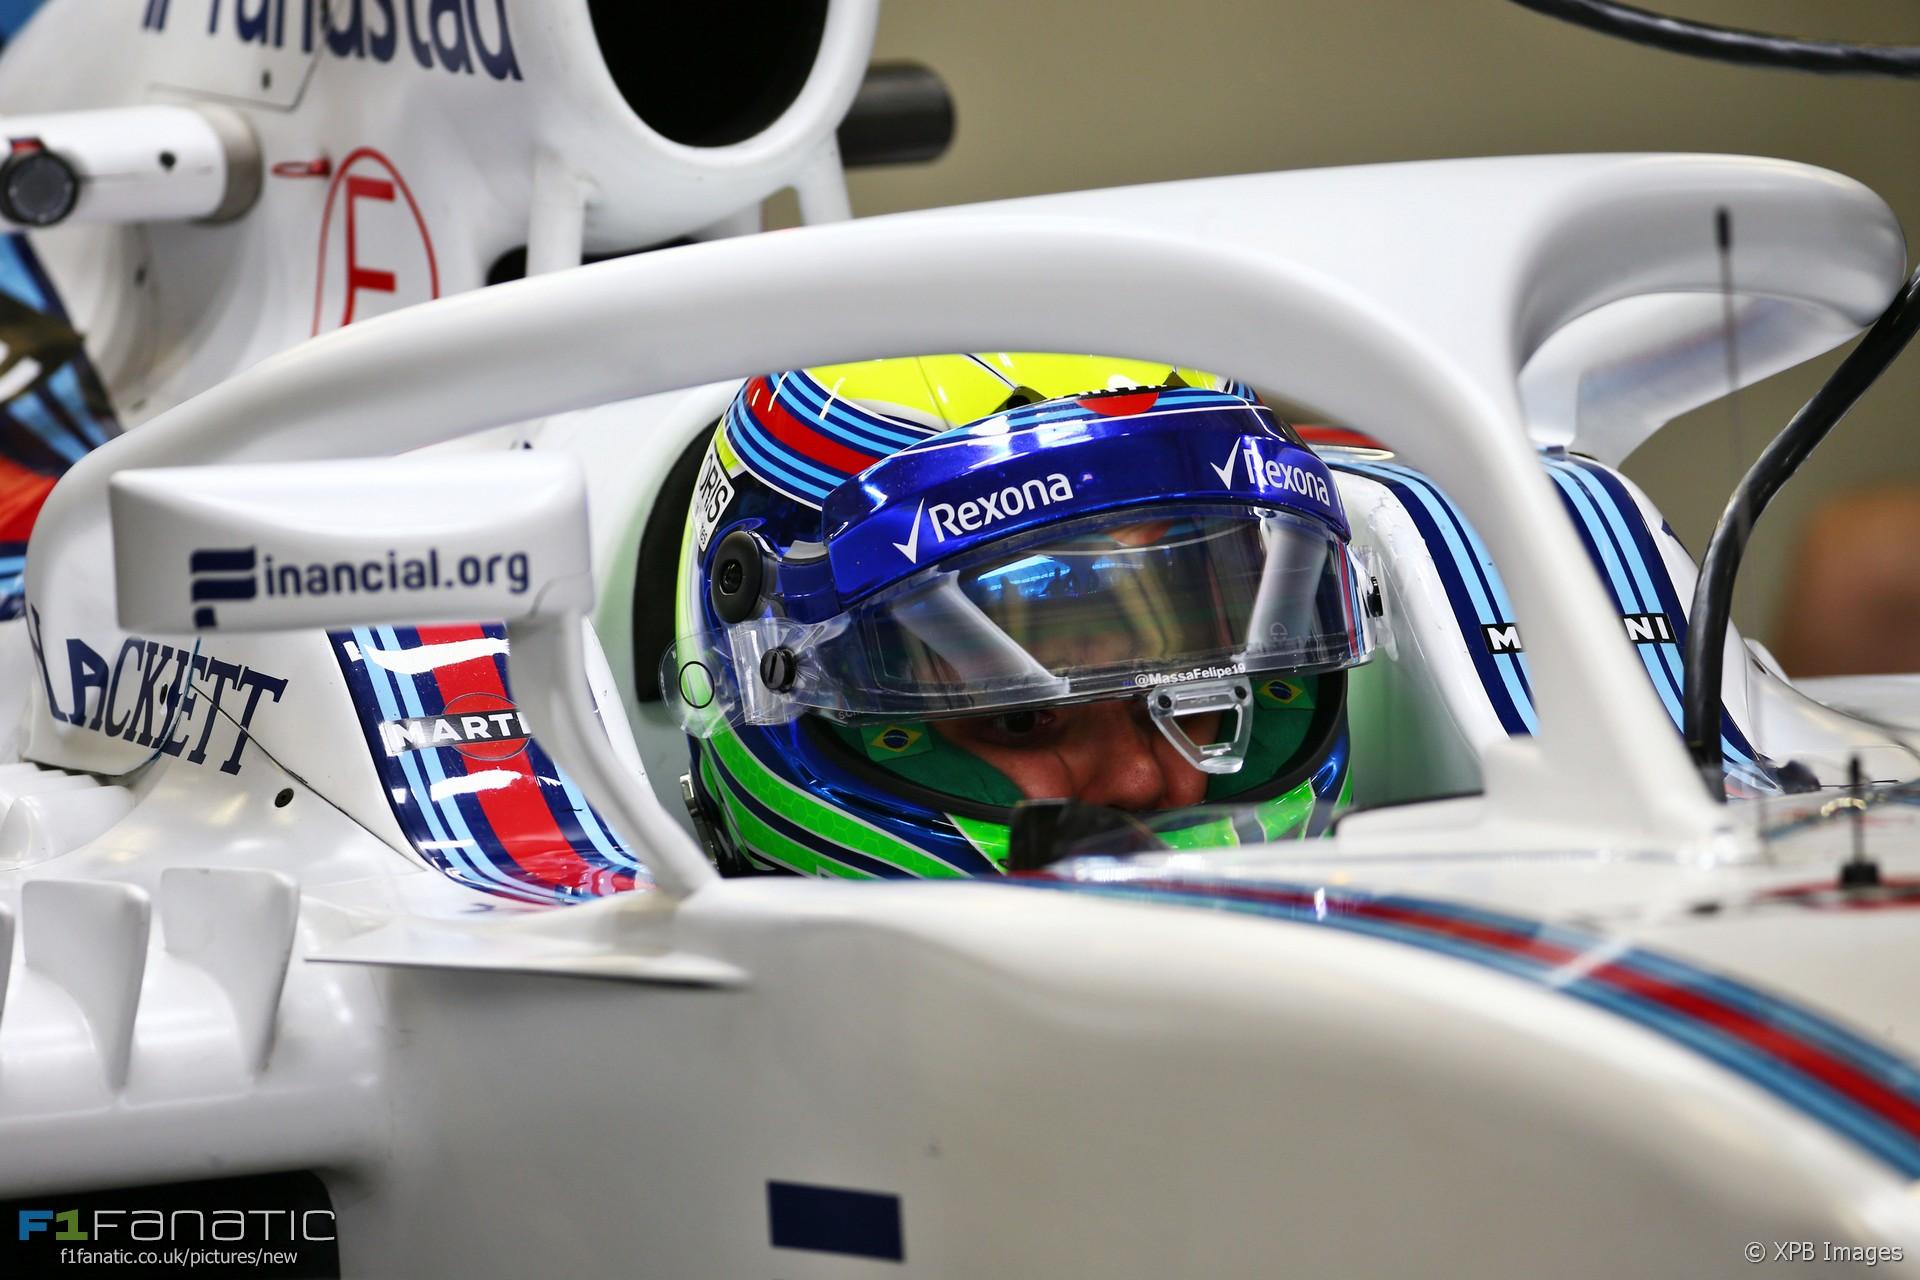 Halo on Felipe Massa's Williams, Autodromo Hermanos Rodriguez, 2016